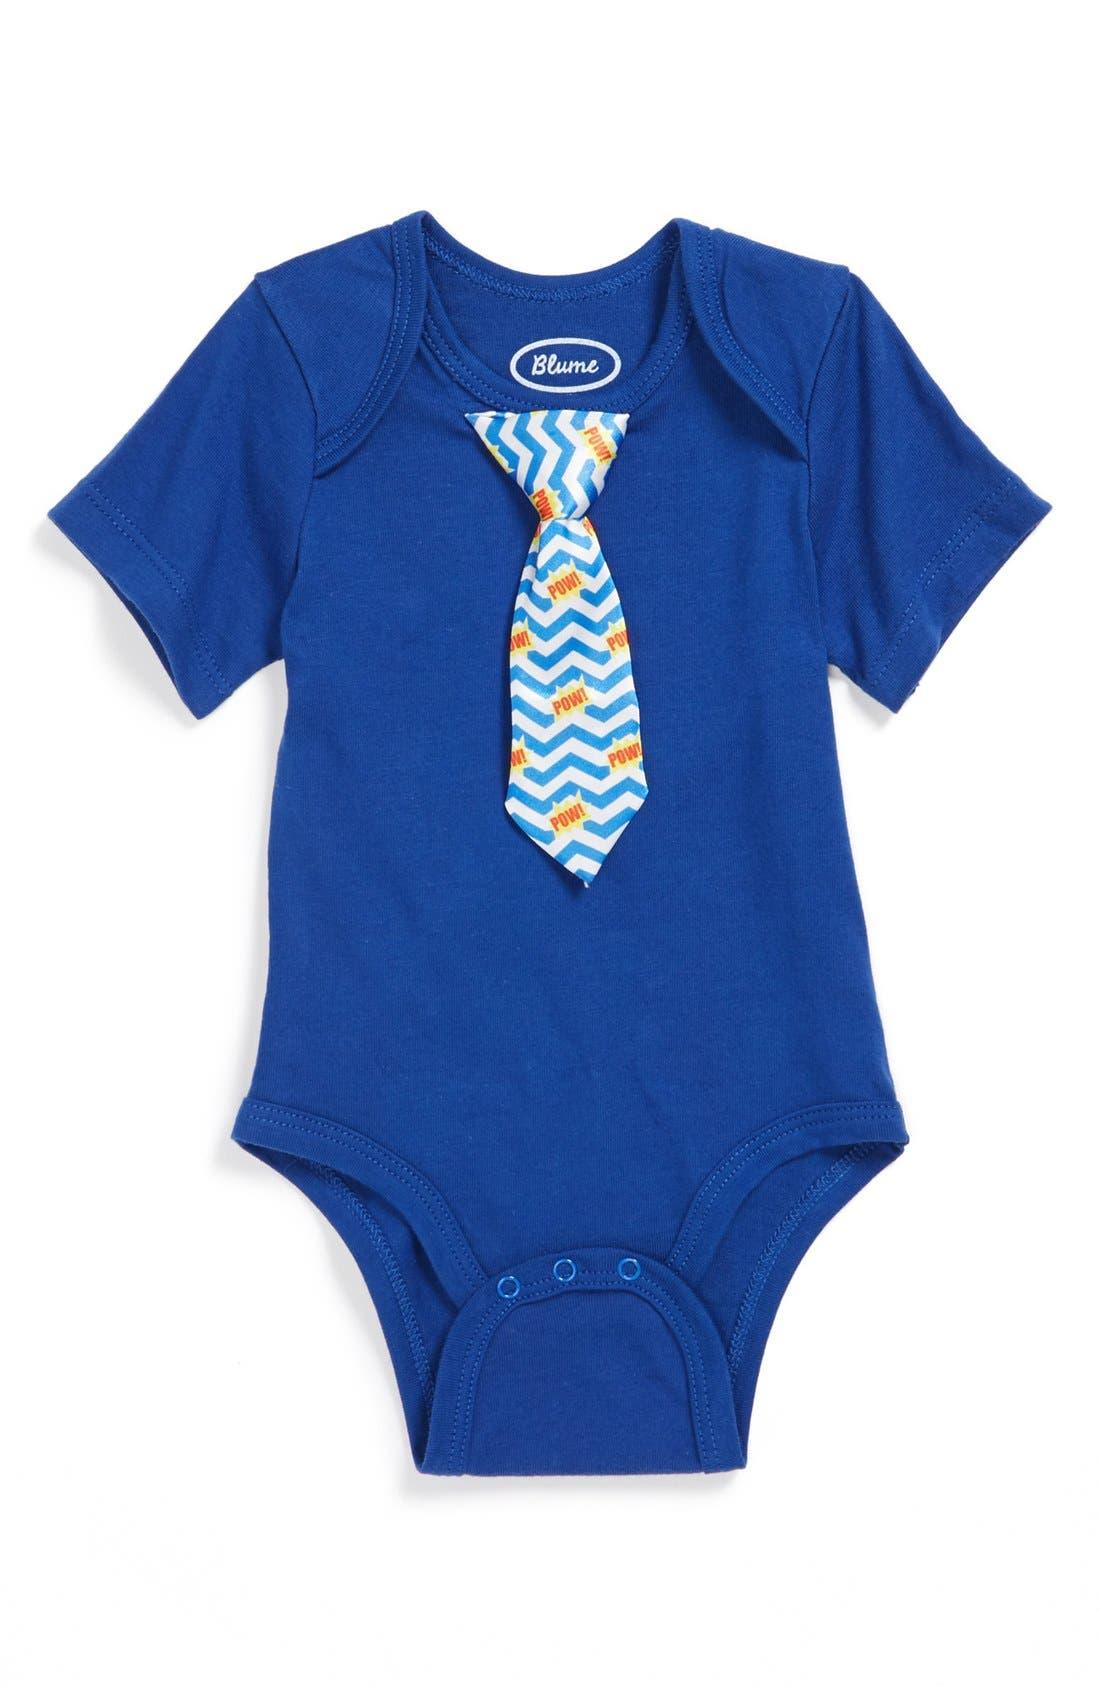 Main Image - Blume 'Tie' Bodysuit (Baby Boys)